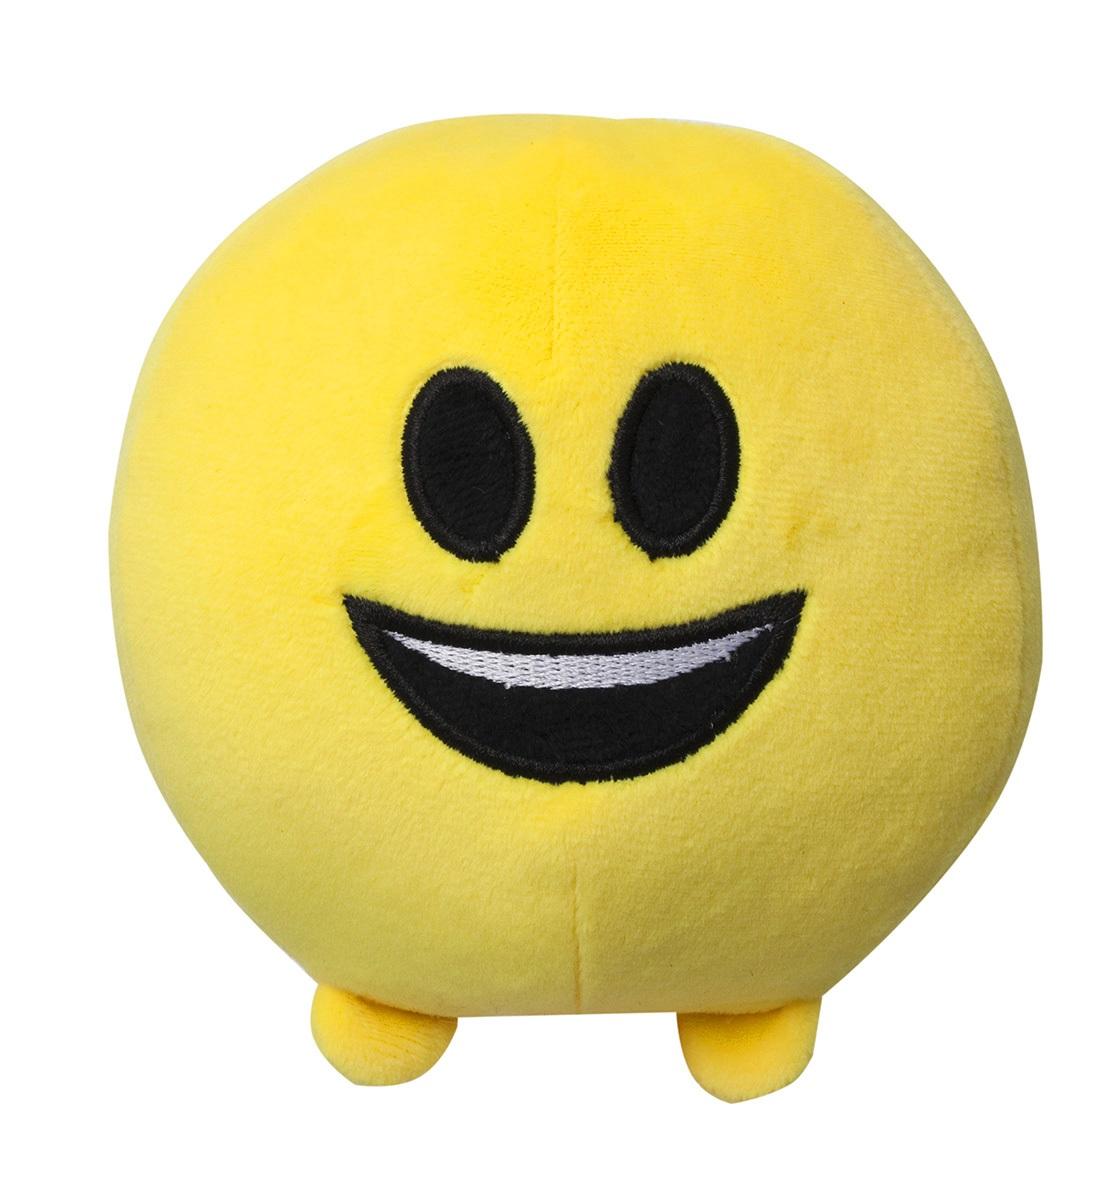 Мягкая игрушка Imoji. Улыбка (11 см)